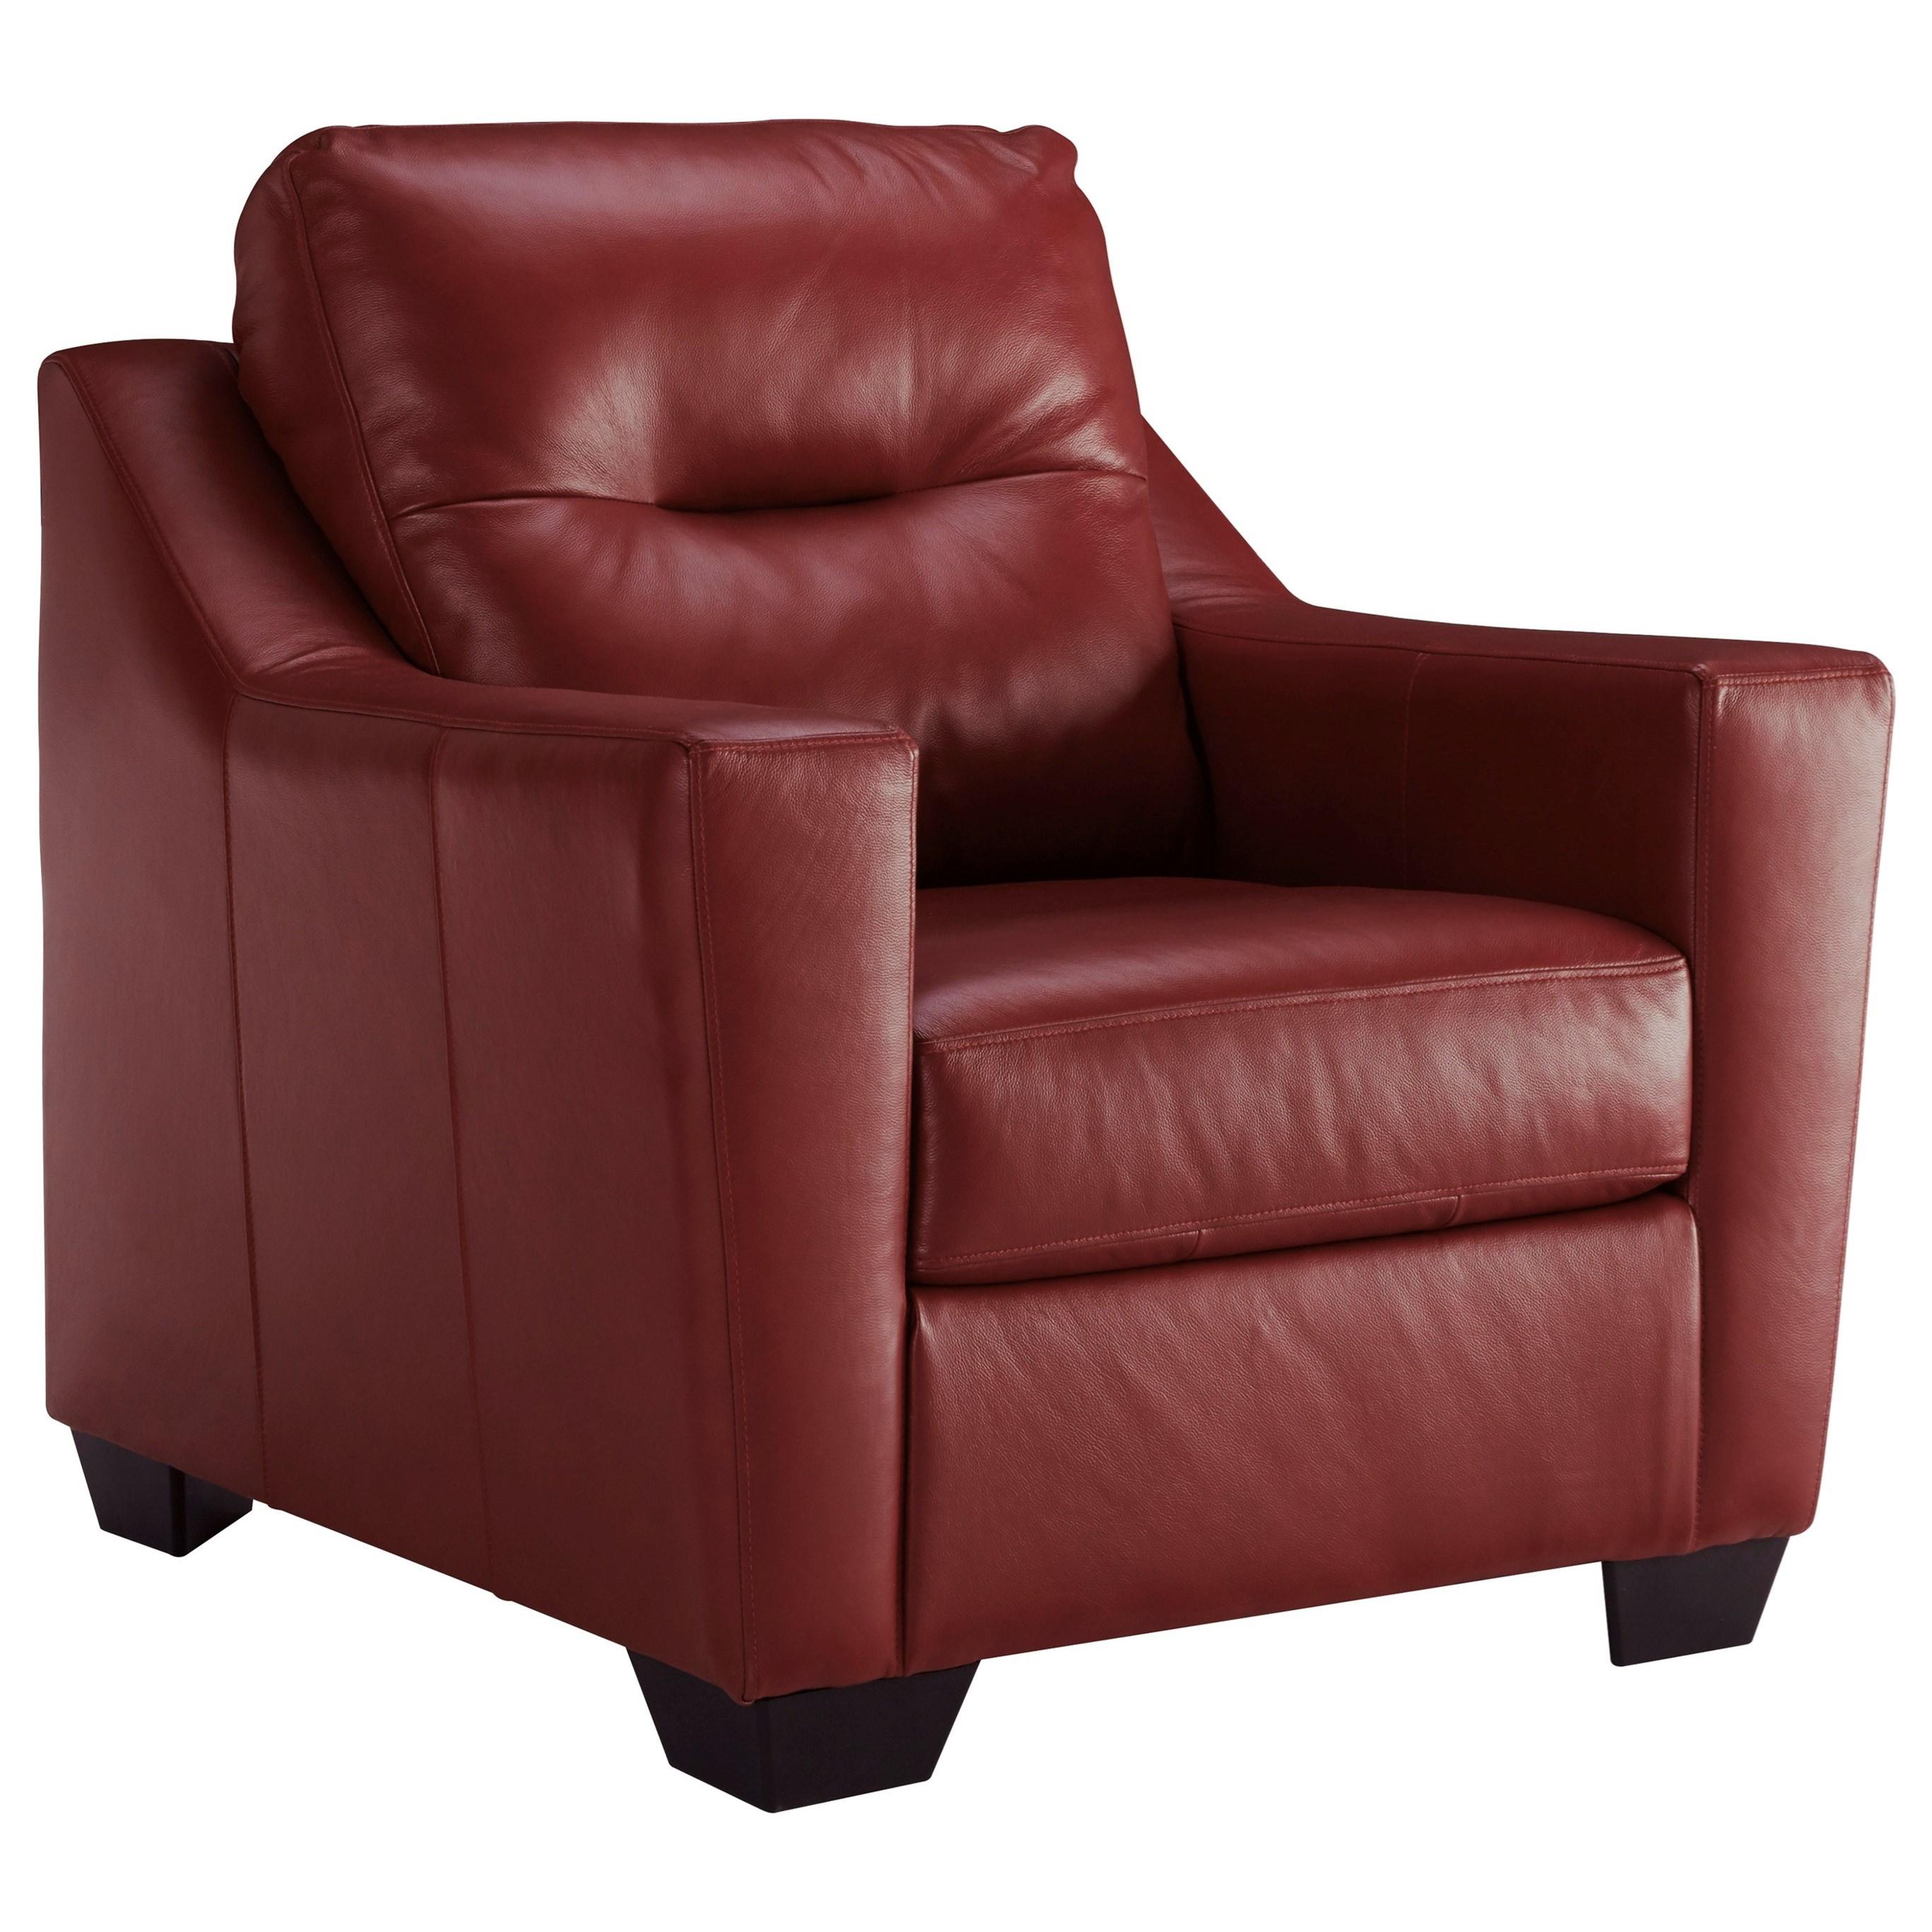 Signature Design by Ashley Kensbridge Chair - Item Number: 6390720